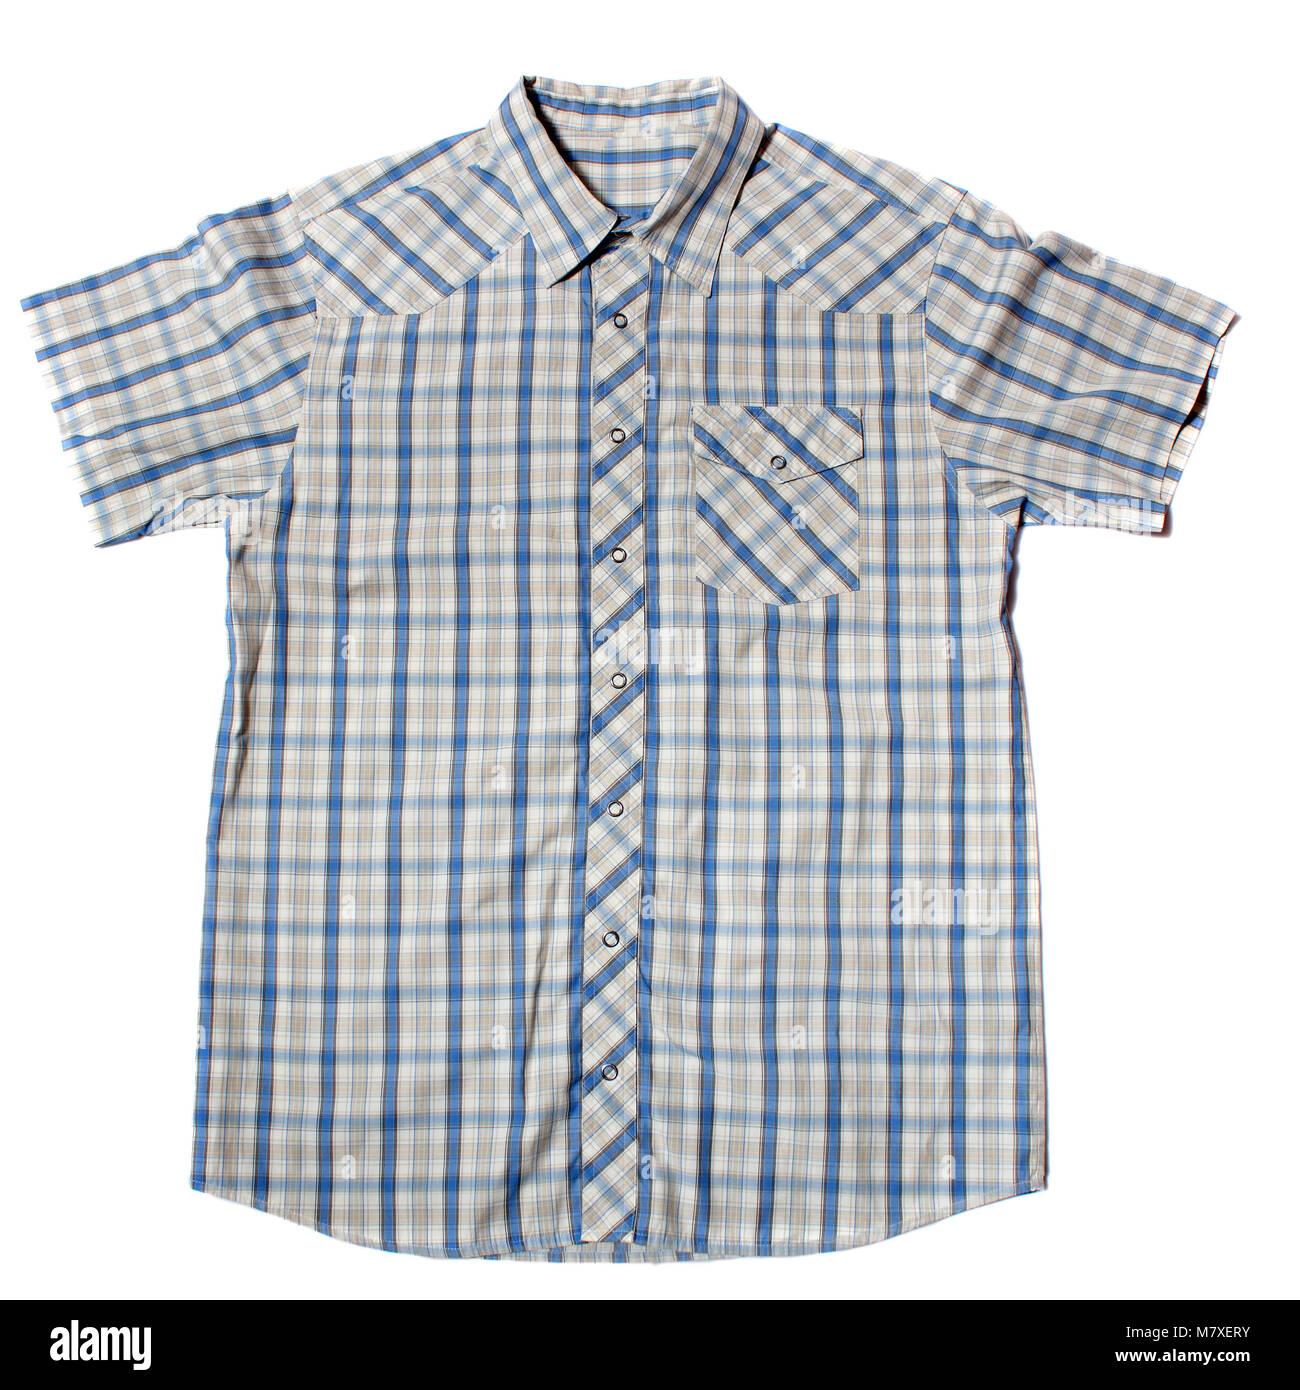 Camiseta de manga corta sobre un fondo blanco. Imagen De Stock